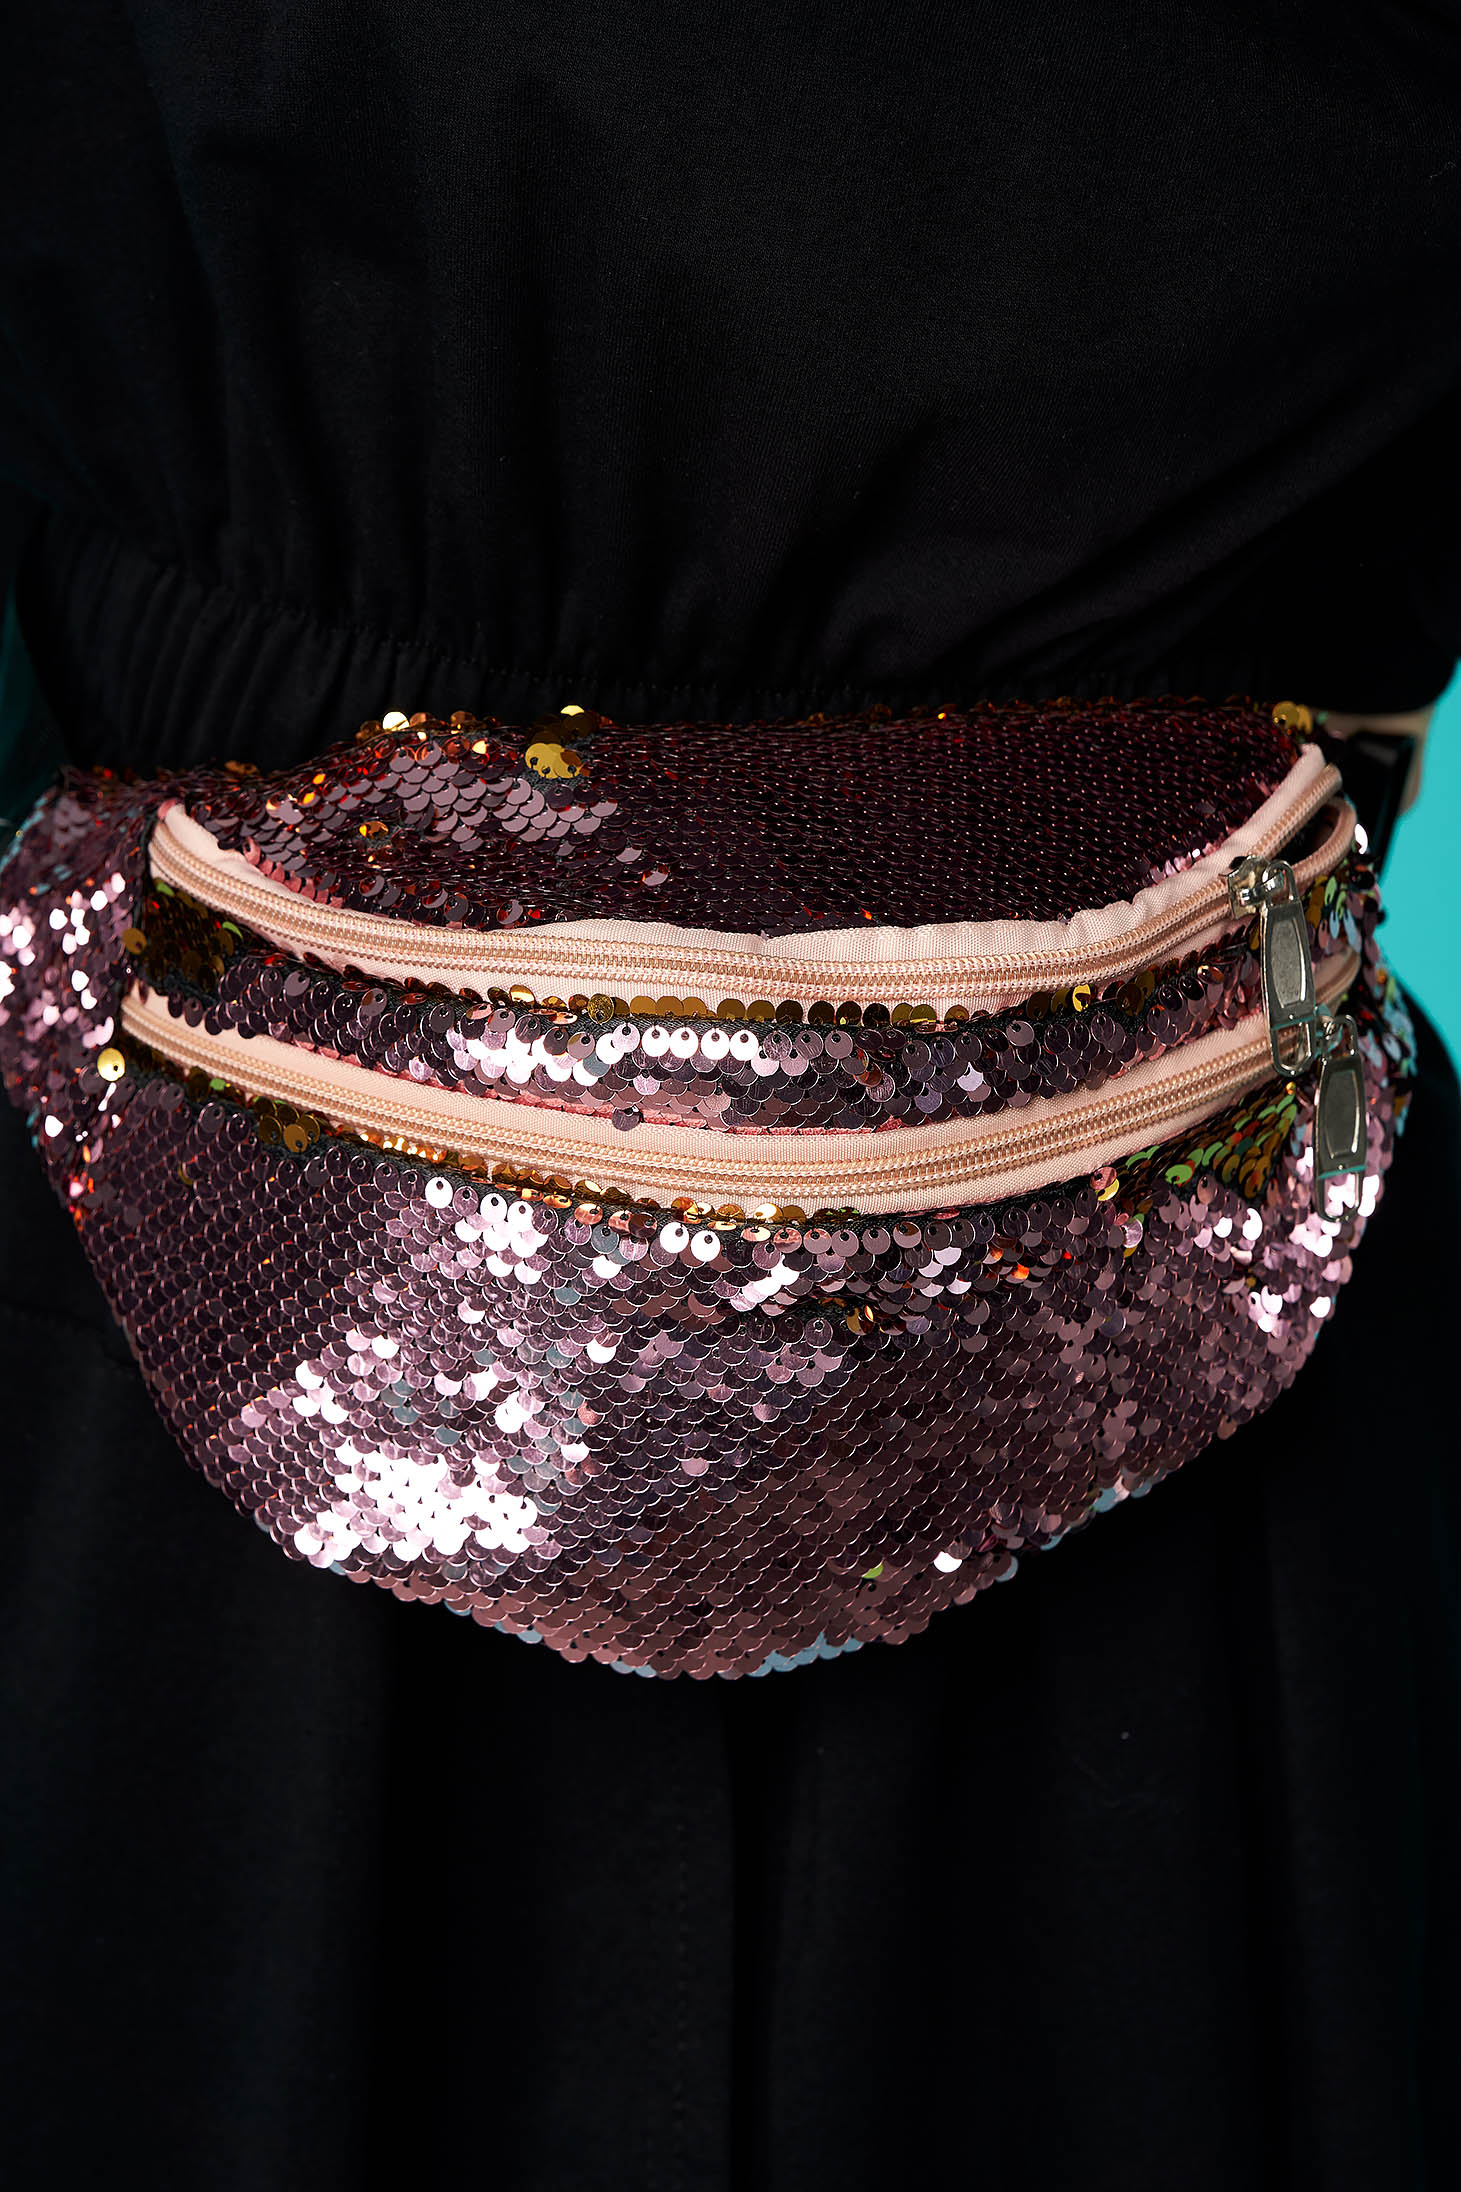 Bag pink zipper accessory with sequin embellished details long, adjustable handle